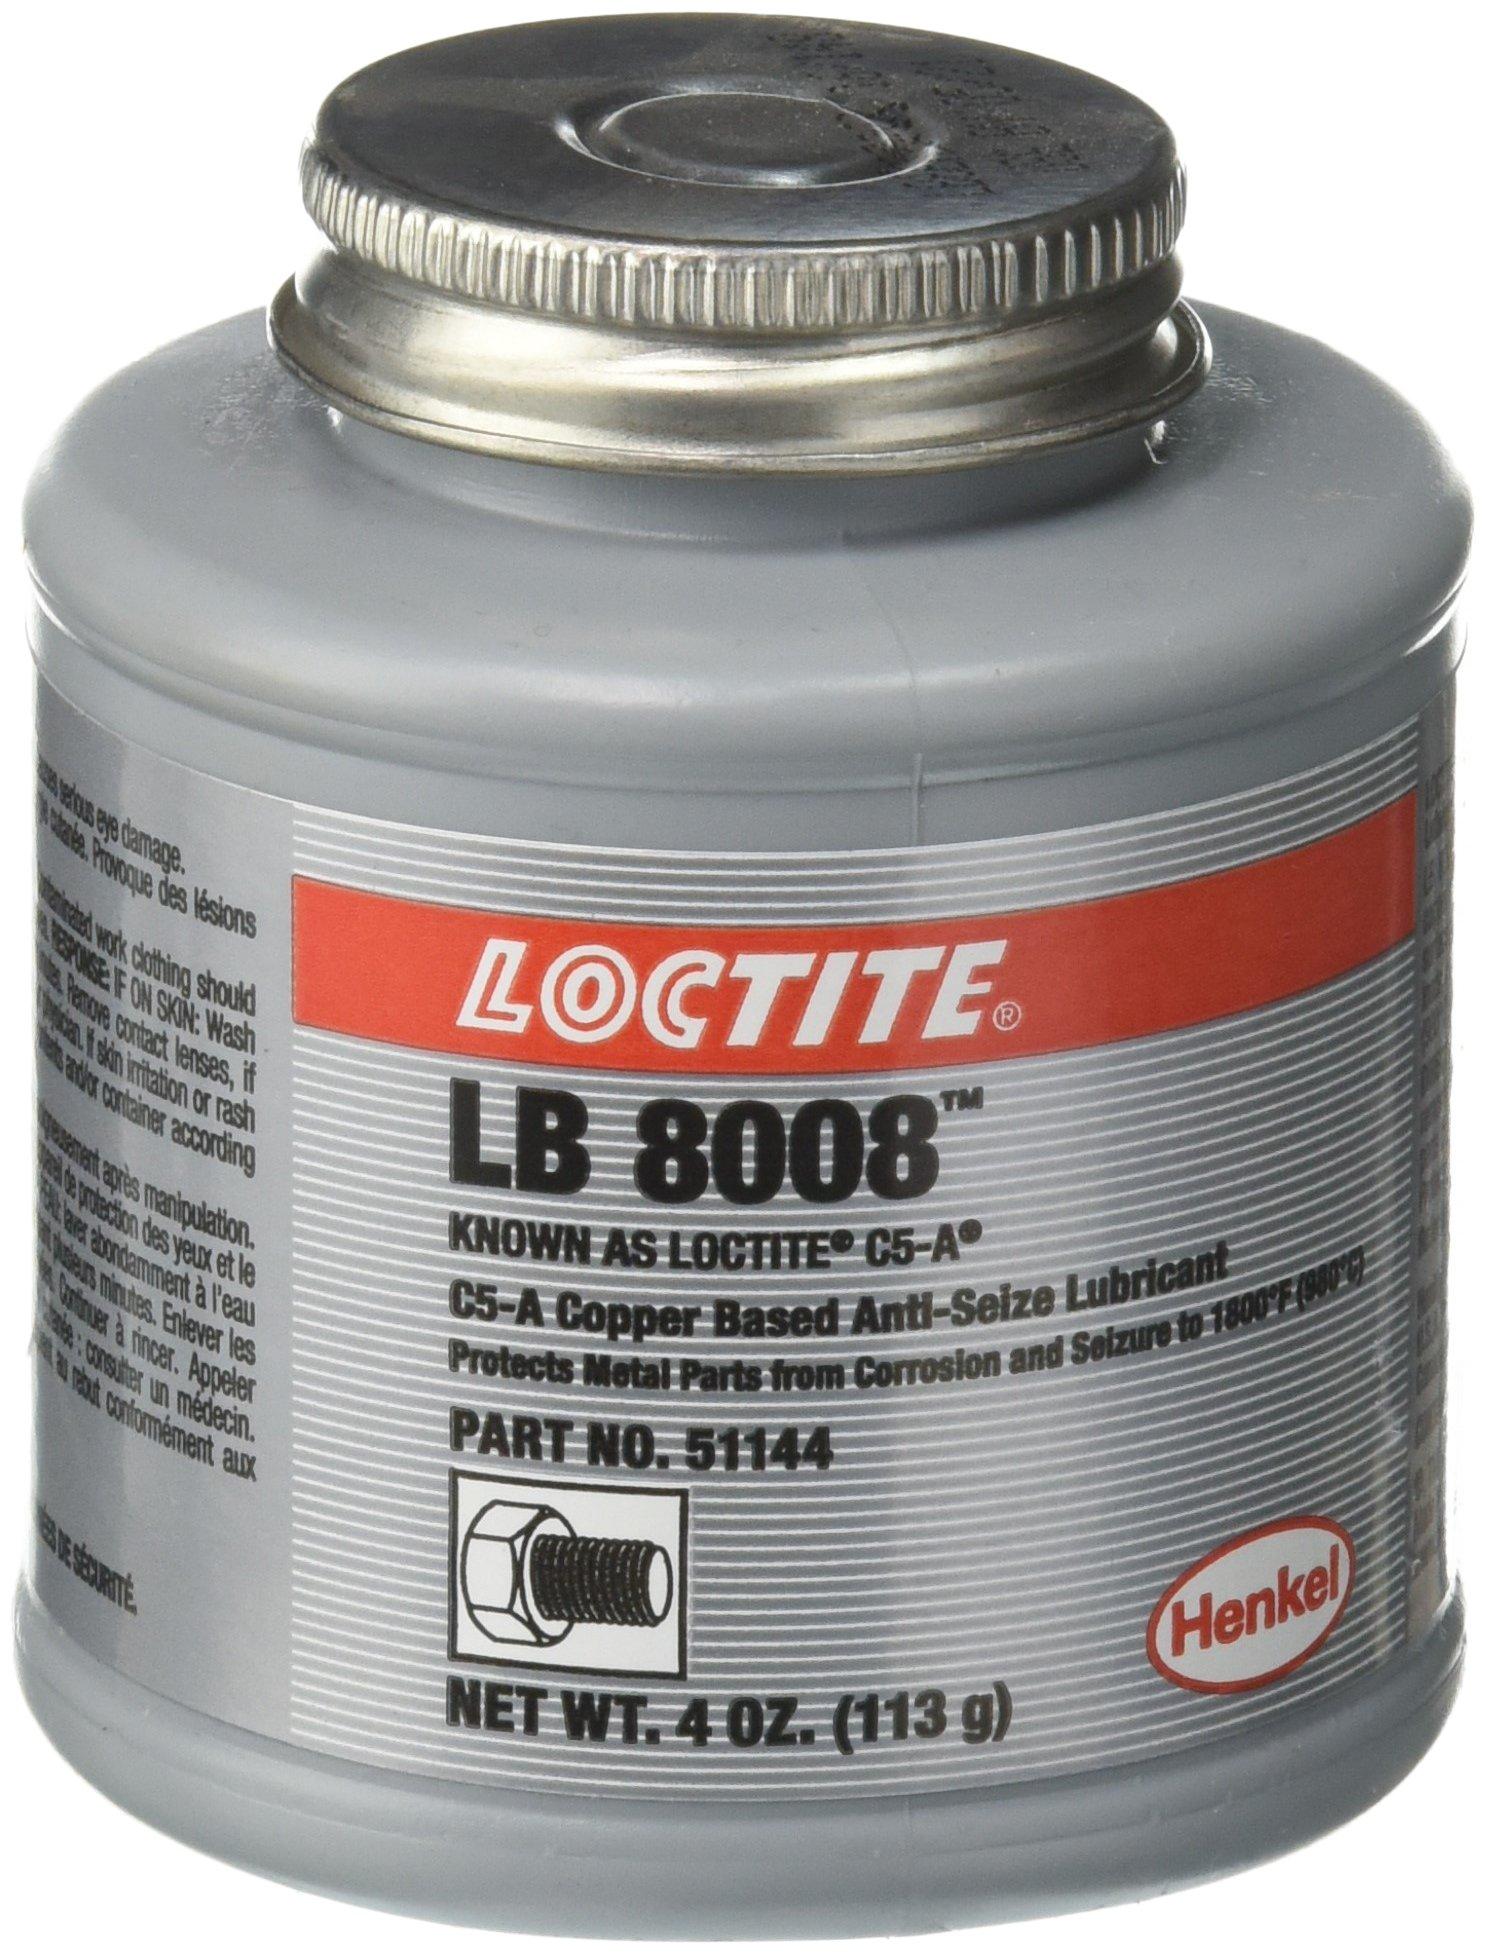 C5-A Copper Based Anti-Seize Lubricant - 4 oz. btc c5a anti-seizecopper base